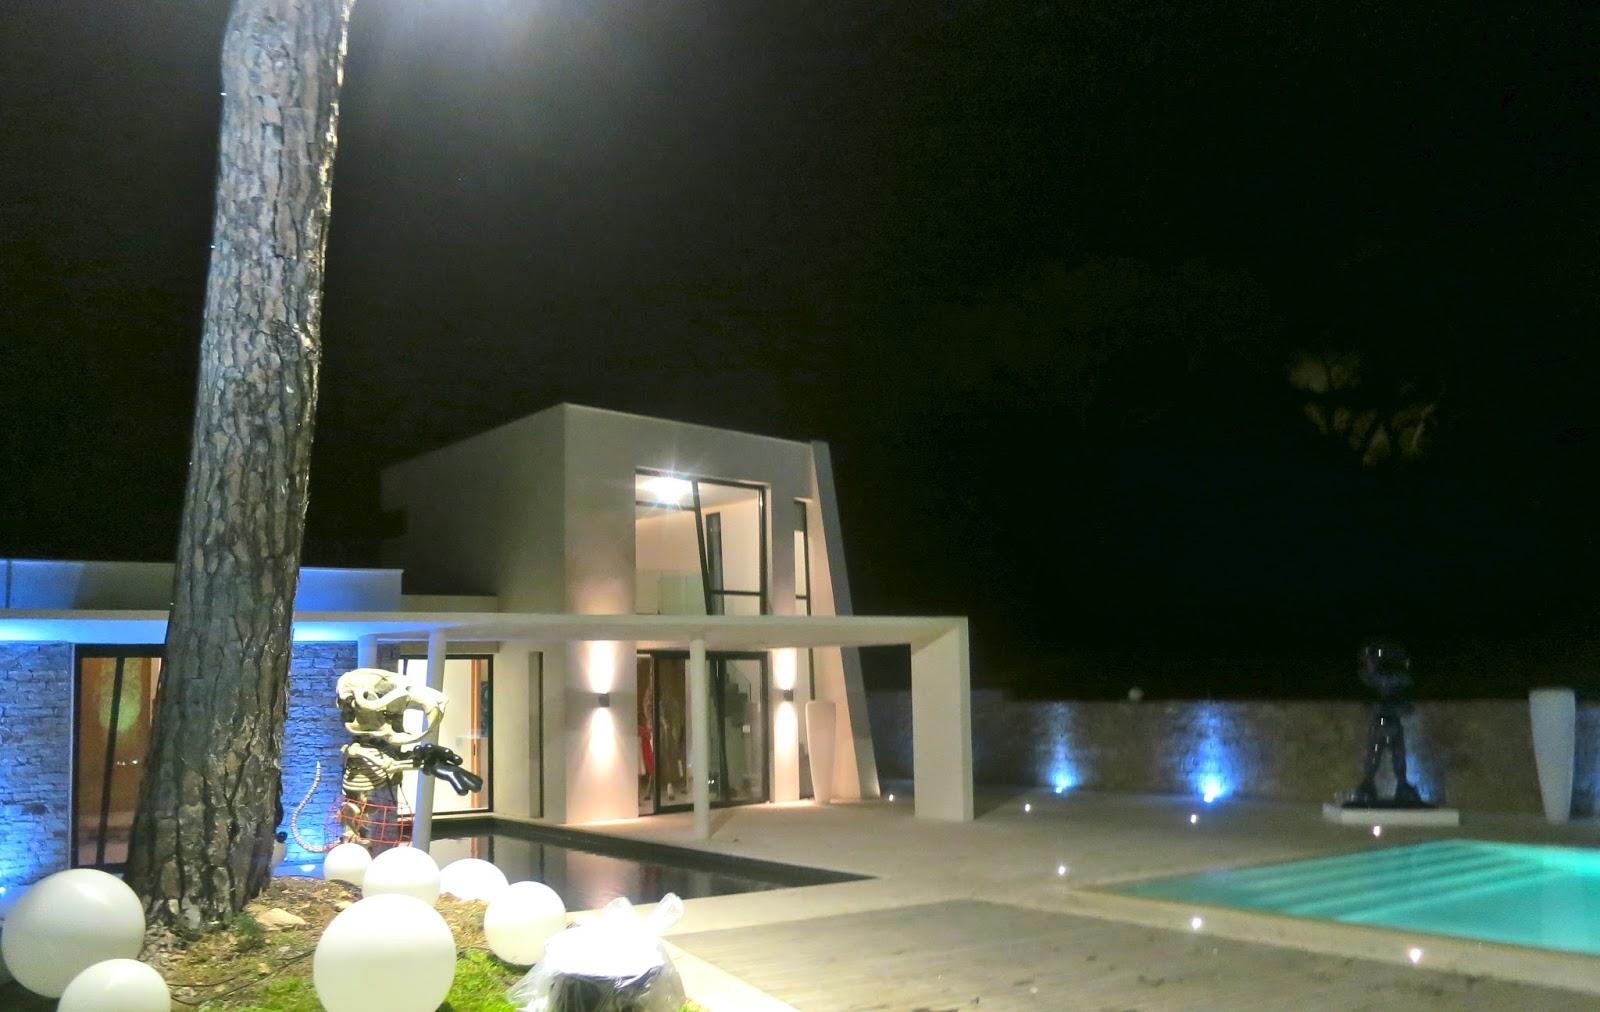 International luxury consulting cedric calmels art dealer for Architecture et art